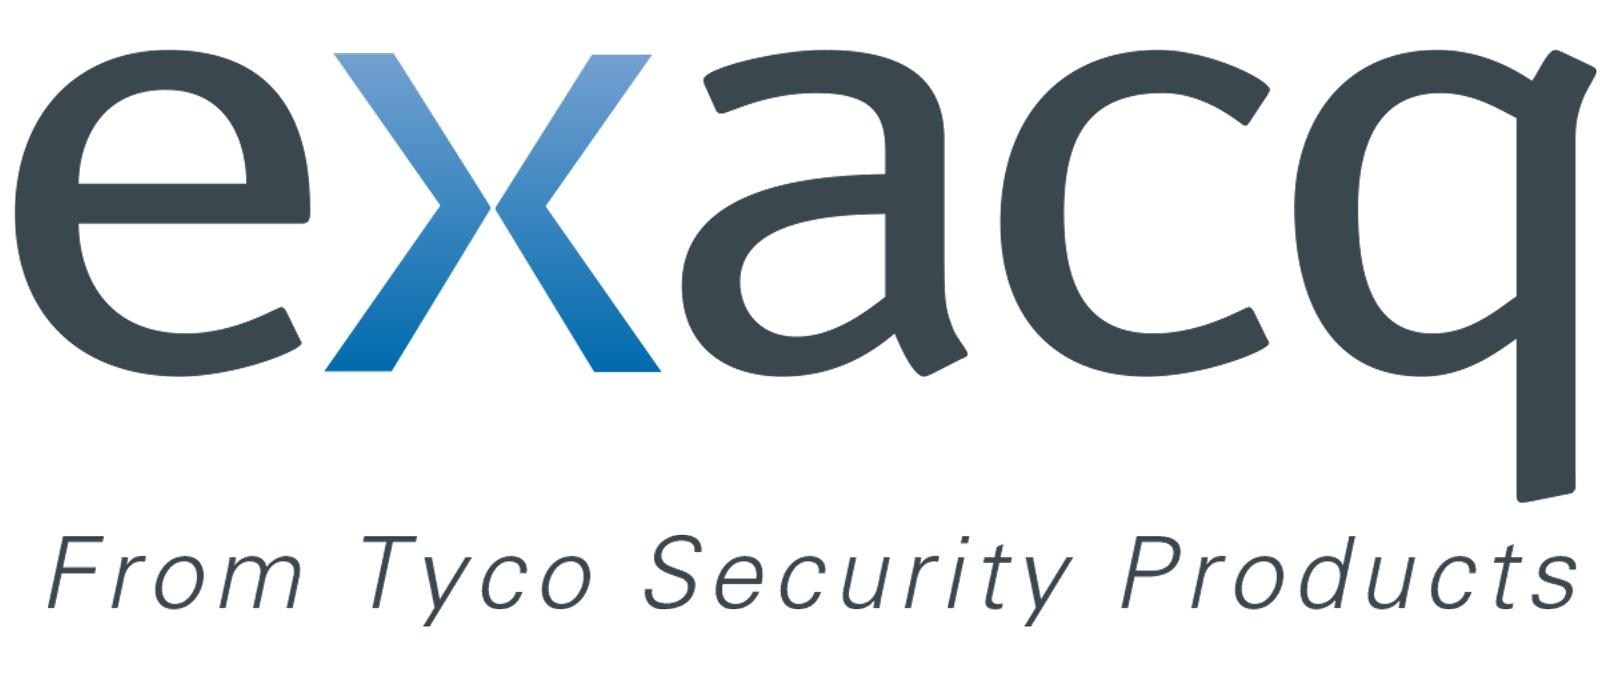 exacq-logo_2013.png